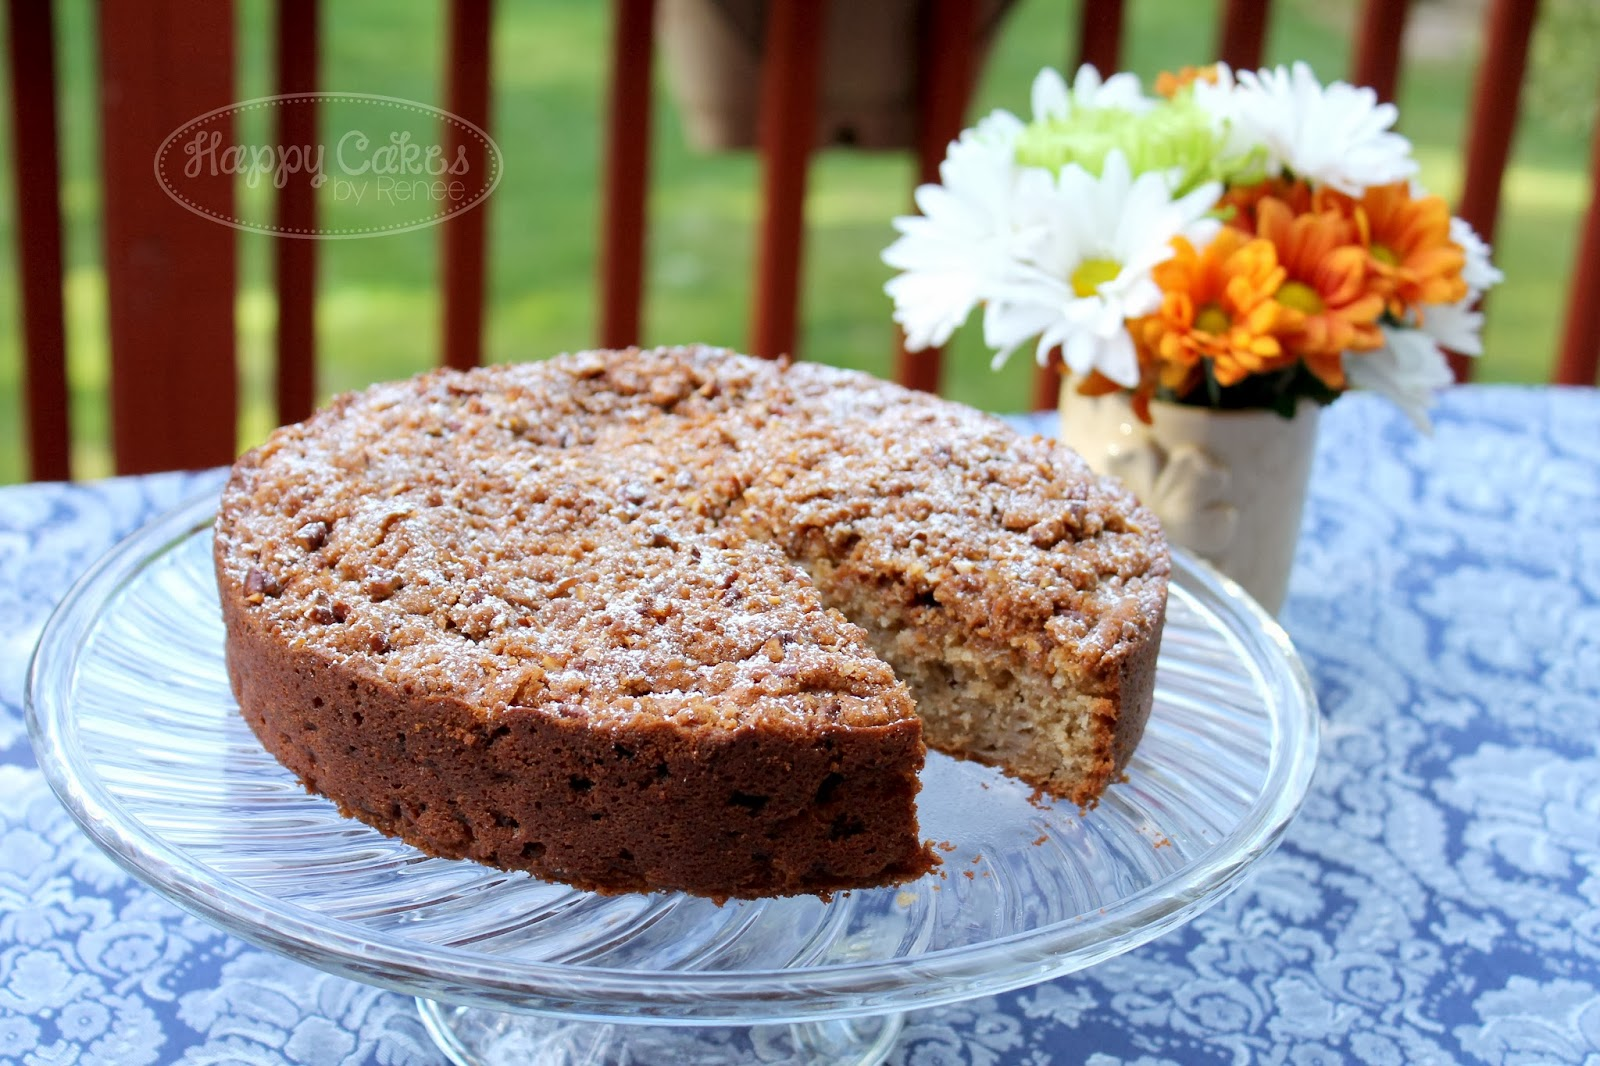 Happy Cakes Bakes: Apple Tea Cake Recipe!